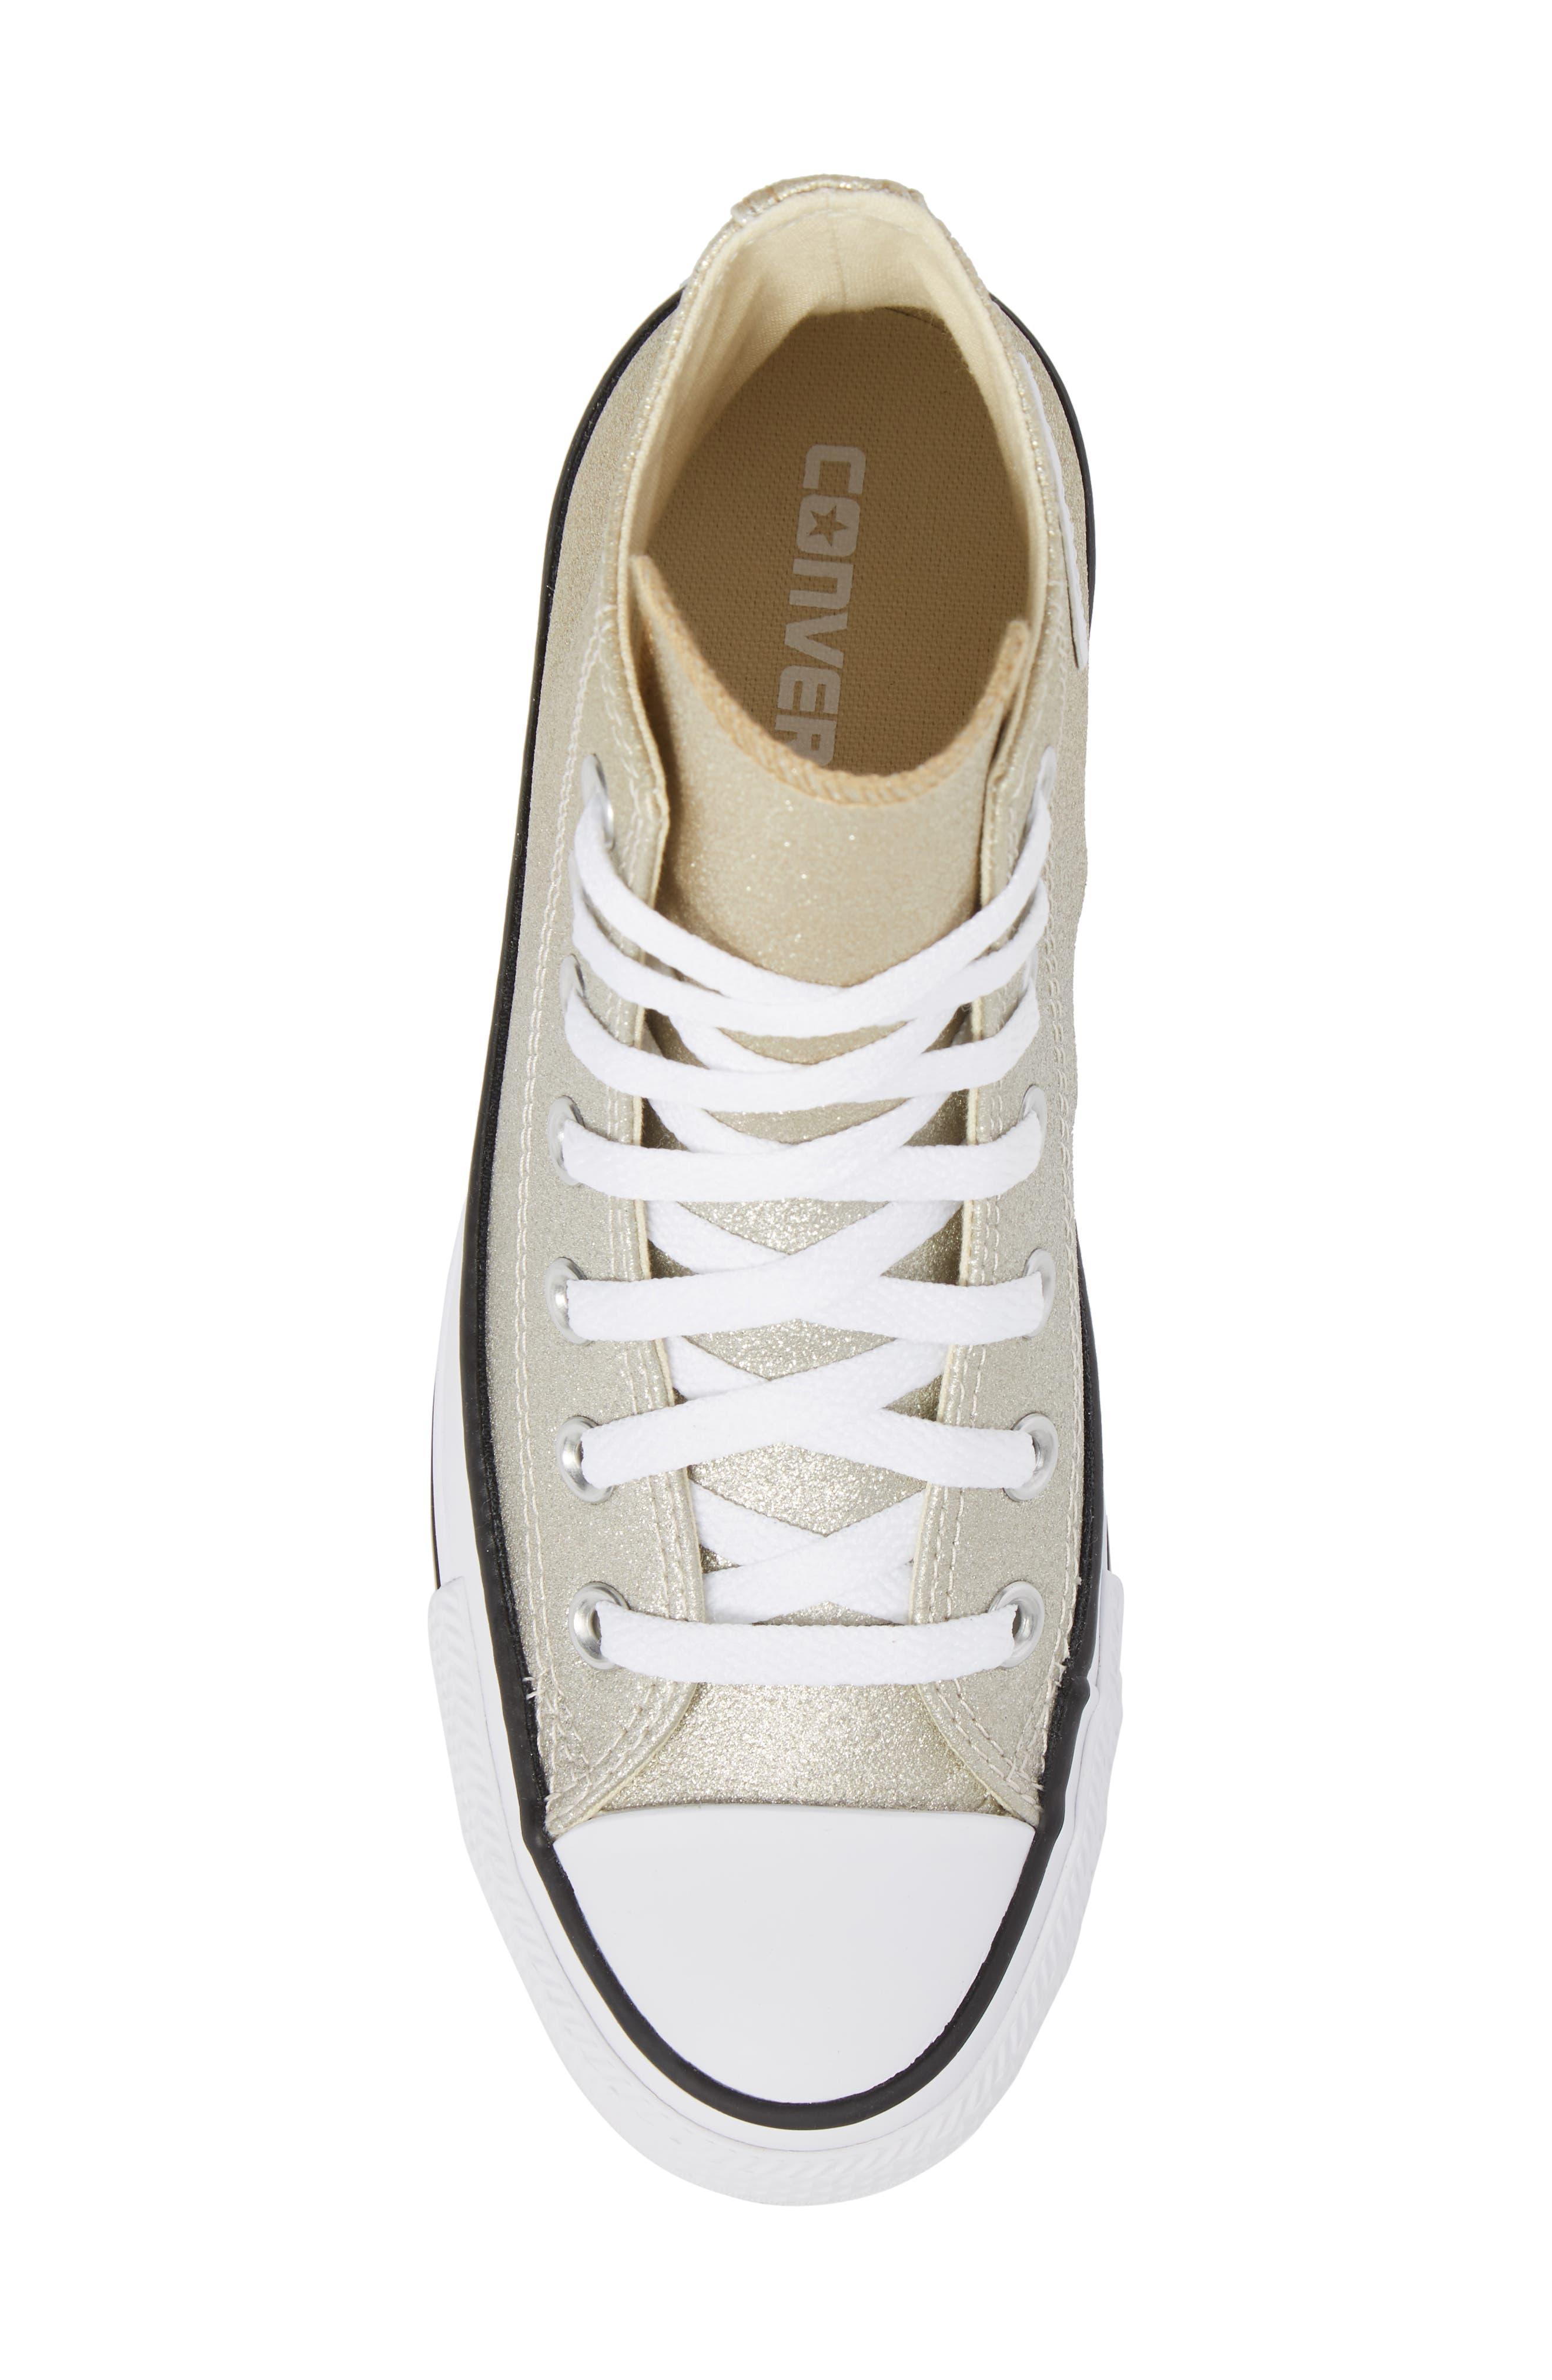 CONVERSE,                             Chuck Taylor<sup>®</sup> All Star<sup>®</sup> Ombré Metallic High Top Sneaker,                             Alternate thumbnail 5, color,                             710